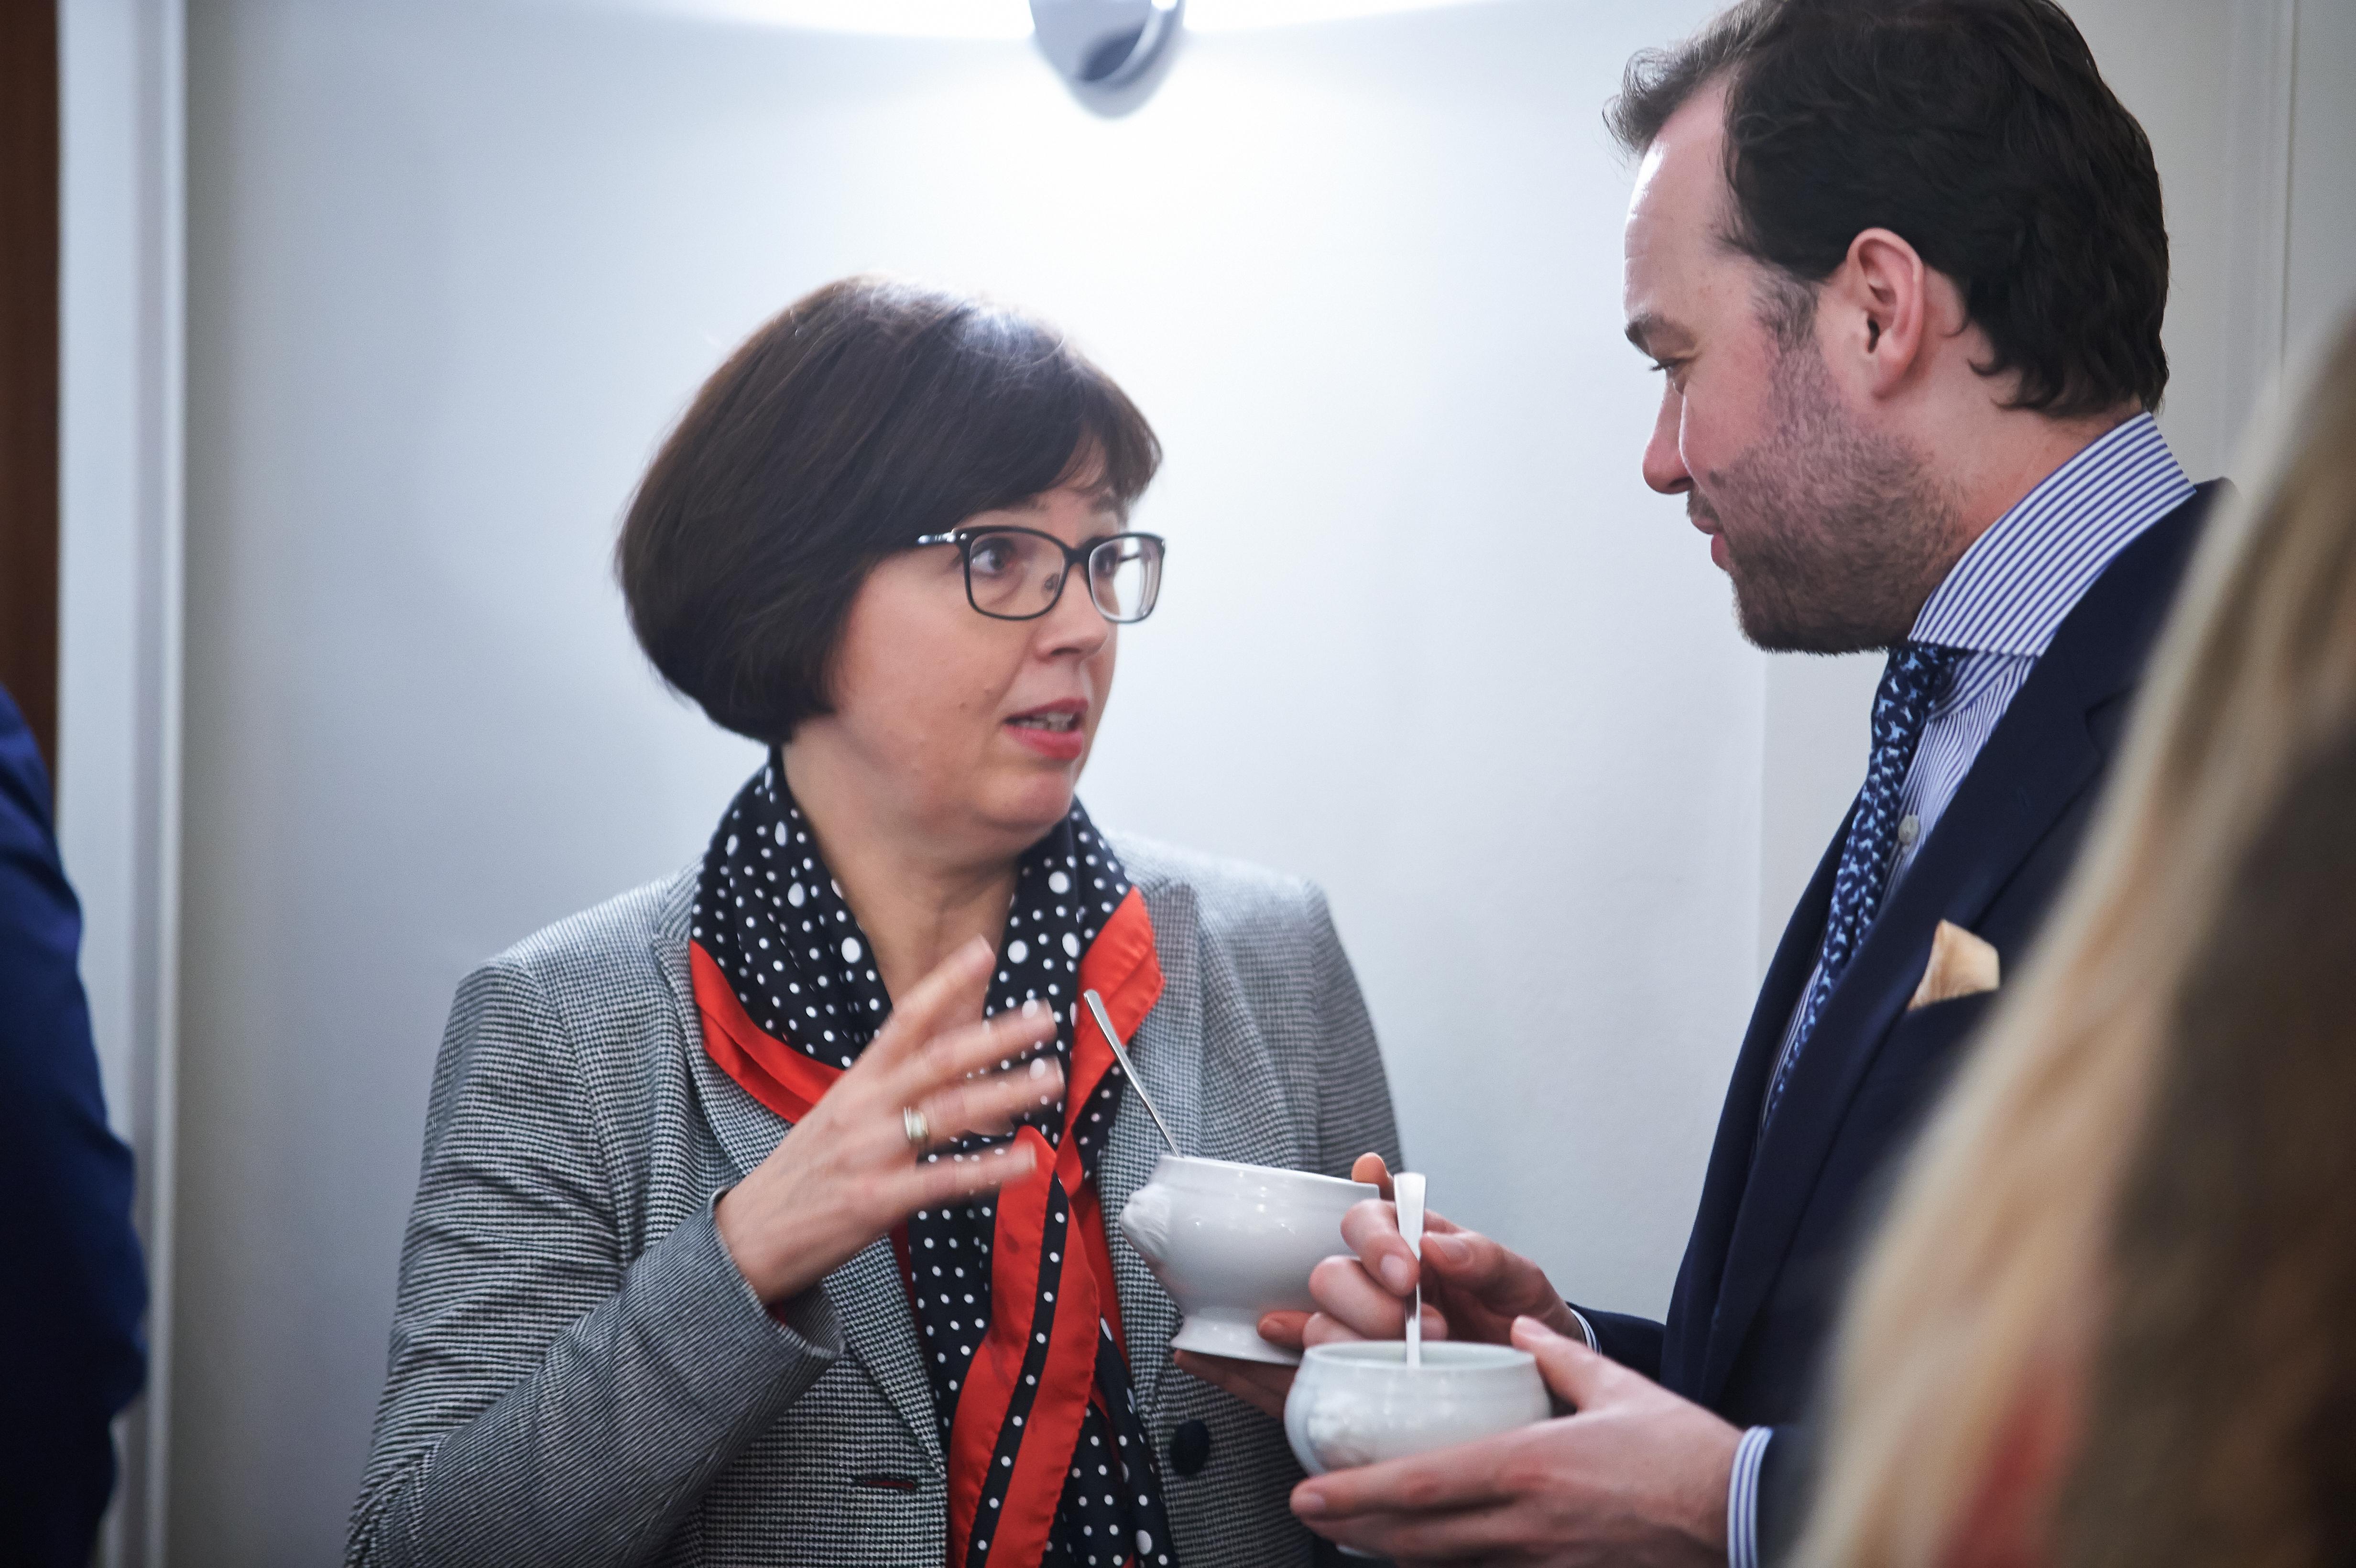 ursula egger - Ilse Aigner zu Gast bei heller & partner